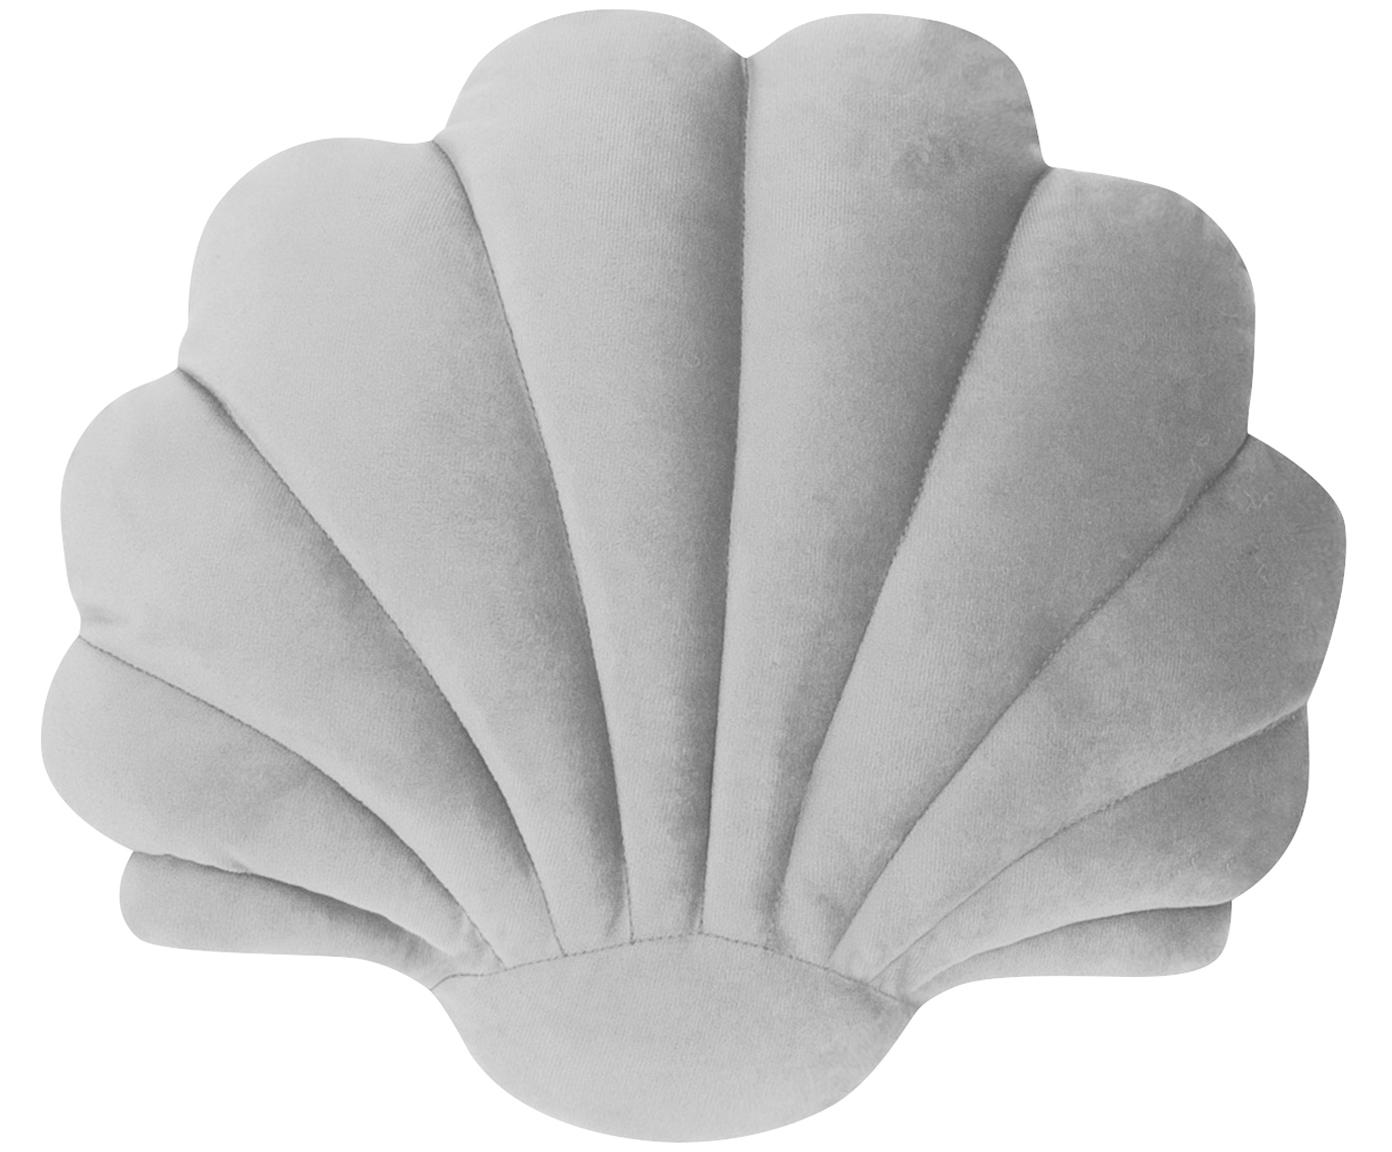 Kussen Shell, Lichtgrijs, 28 x 30 cm